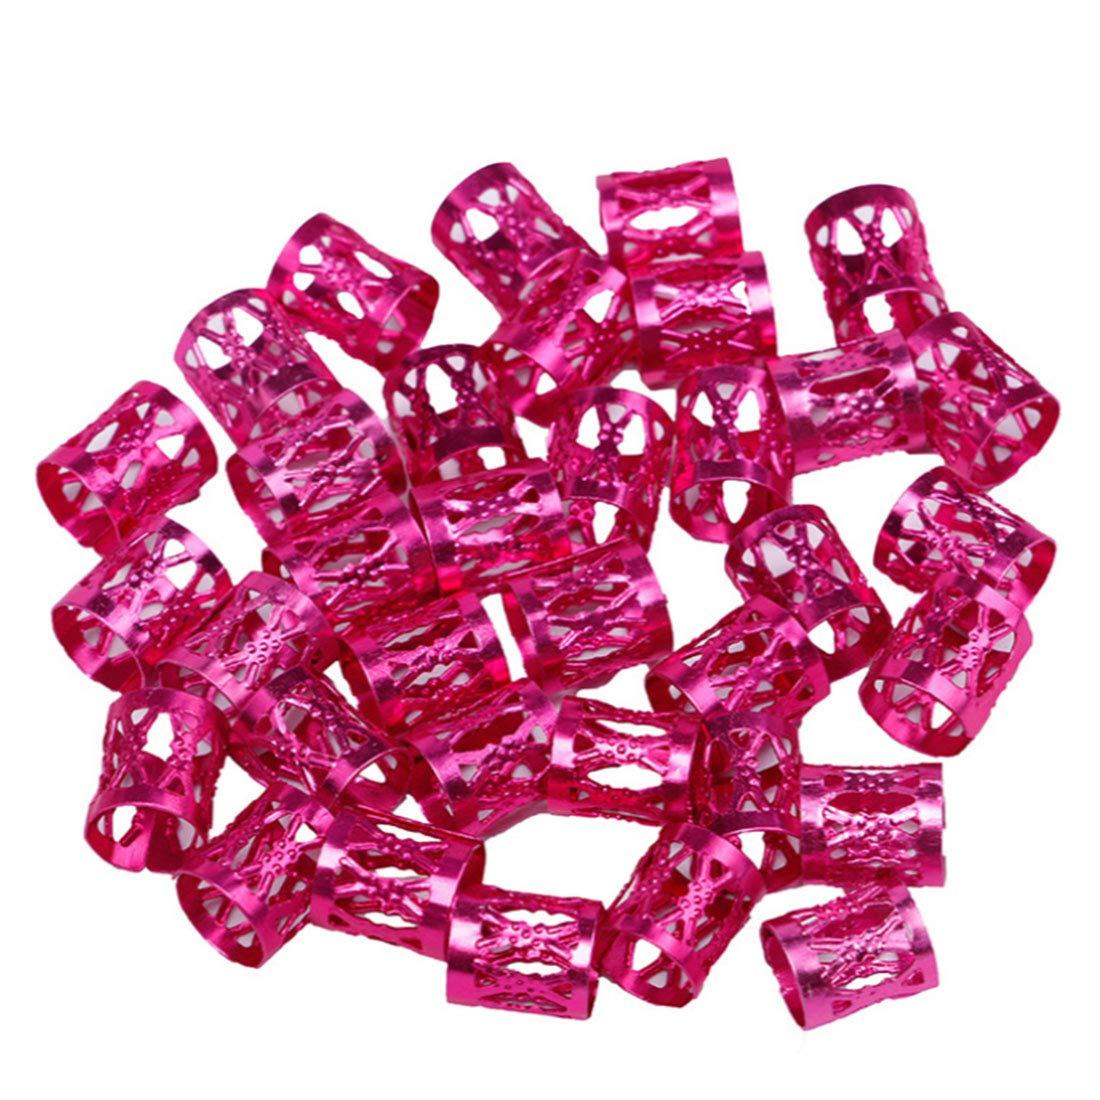 50pcs 8mm Dreadlock Bead Adjustable Hair Braid Rings Cuffs Clips Tubes Jewelry